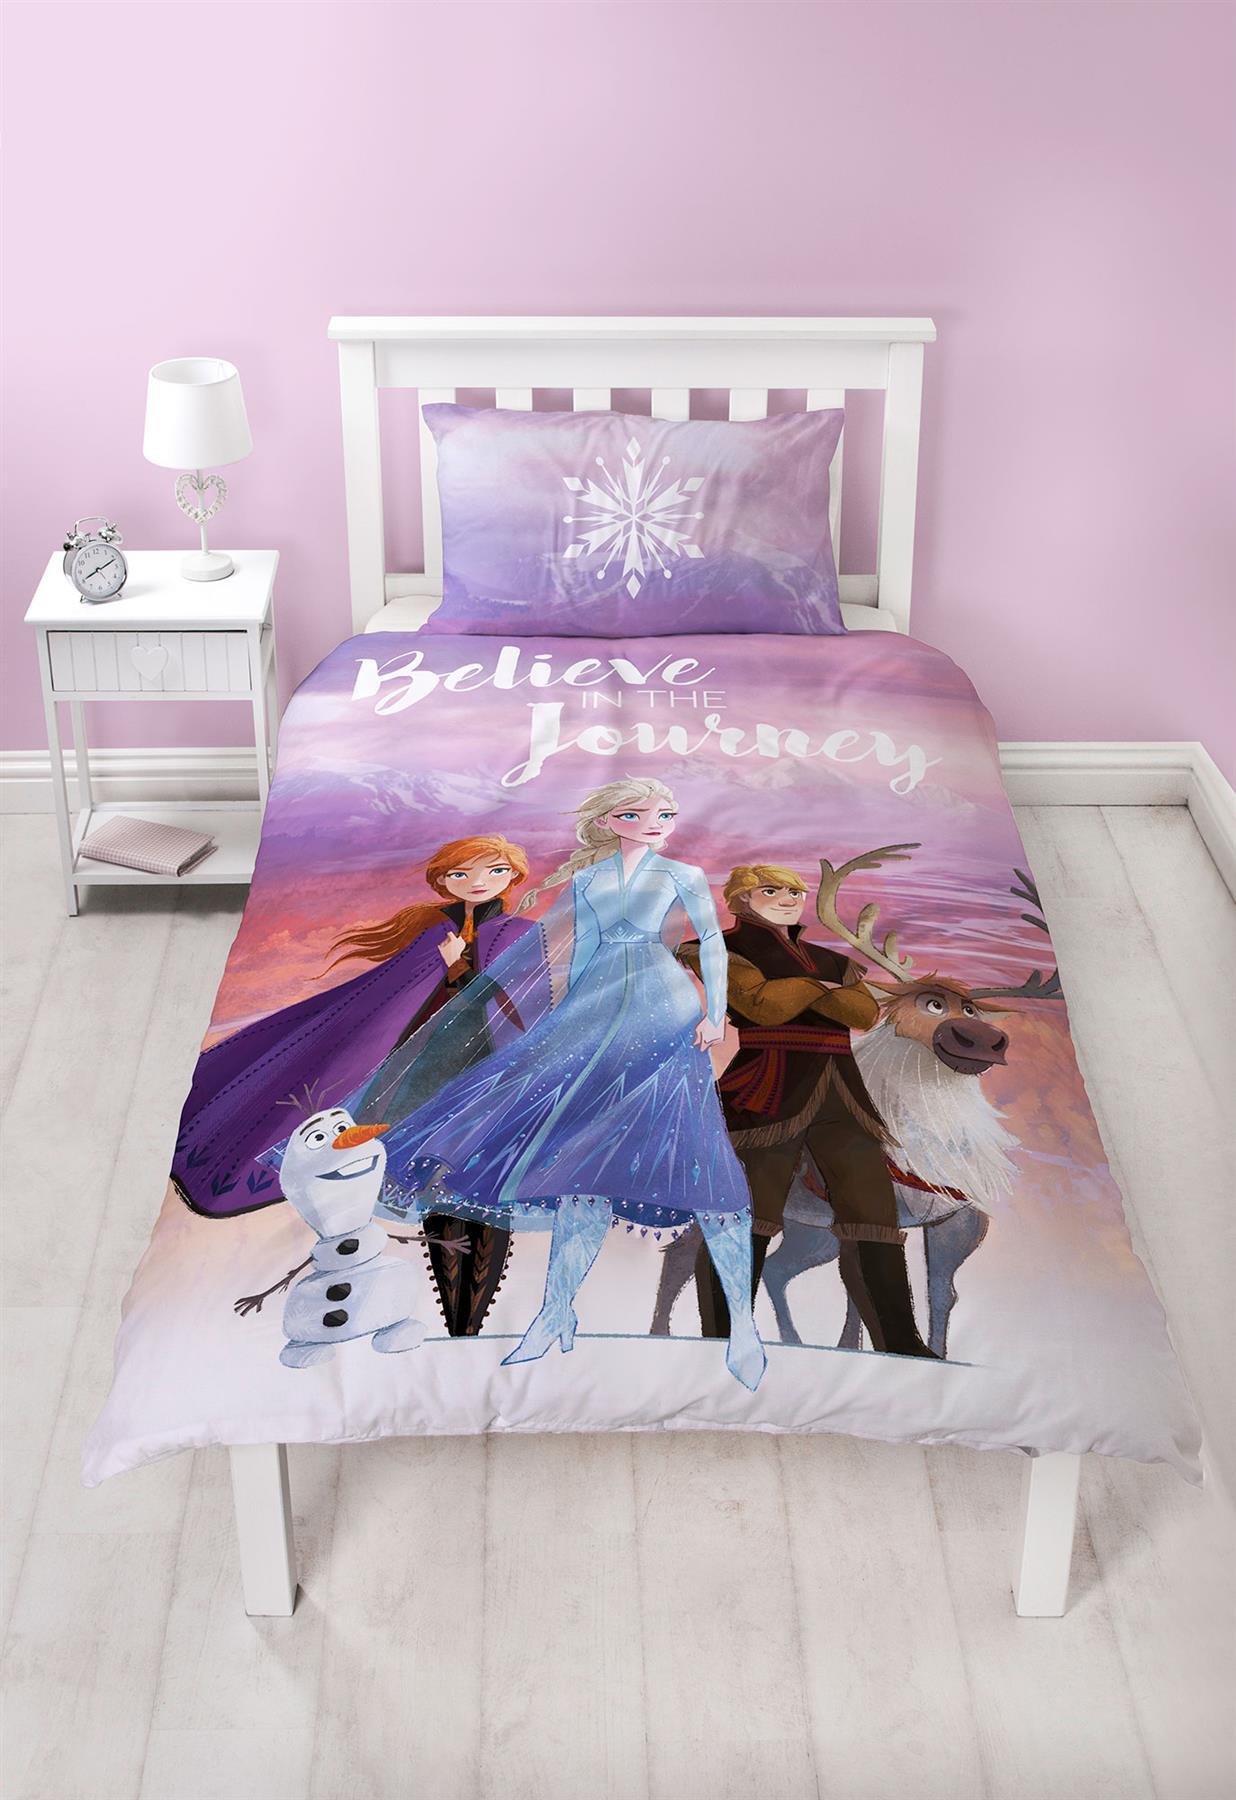 Official-Frozen-2-Duvet-Covers-Single-Double-Reversible-Bedding-Elsa-Anna-Olaf thumbnail 13